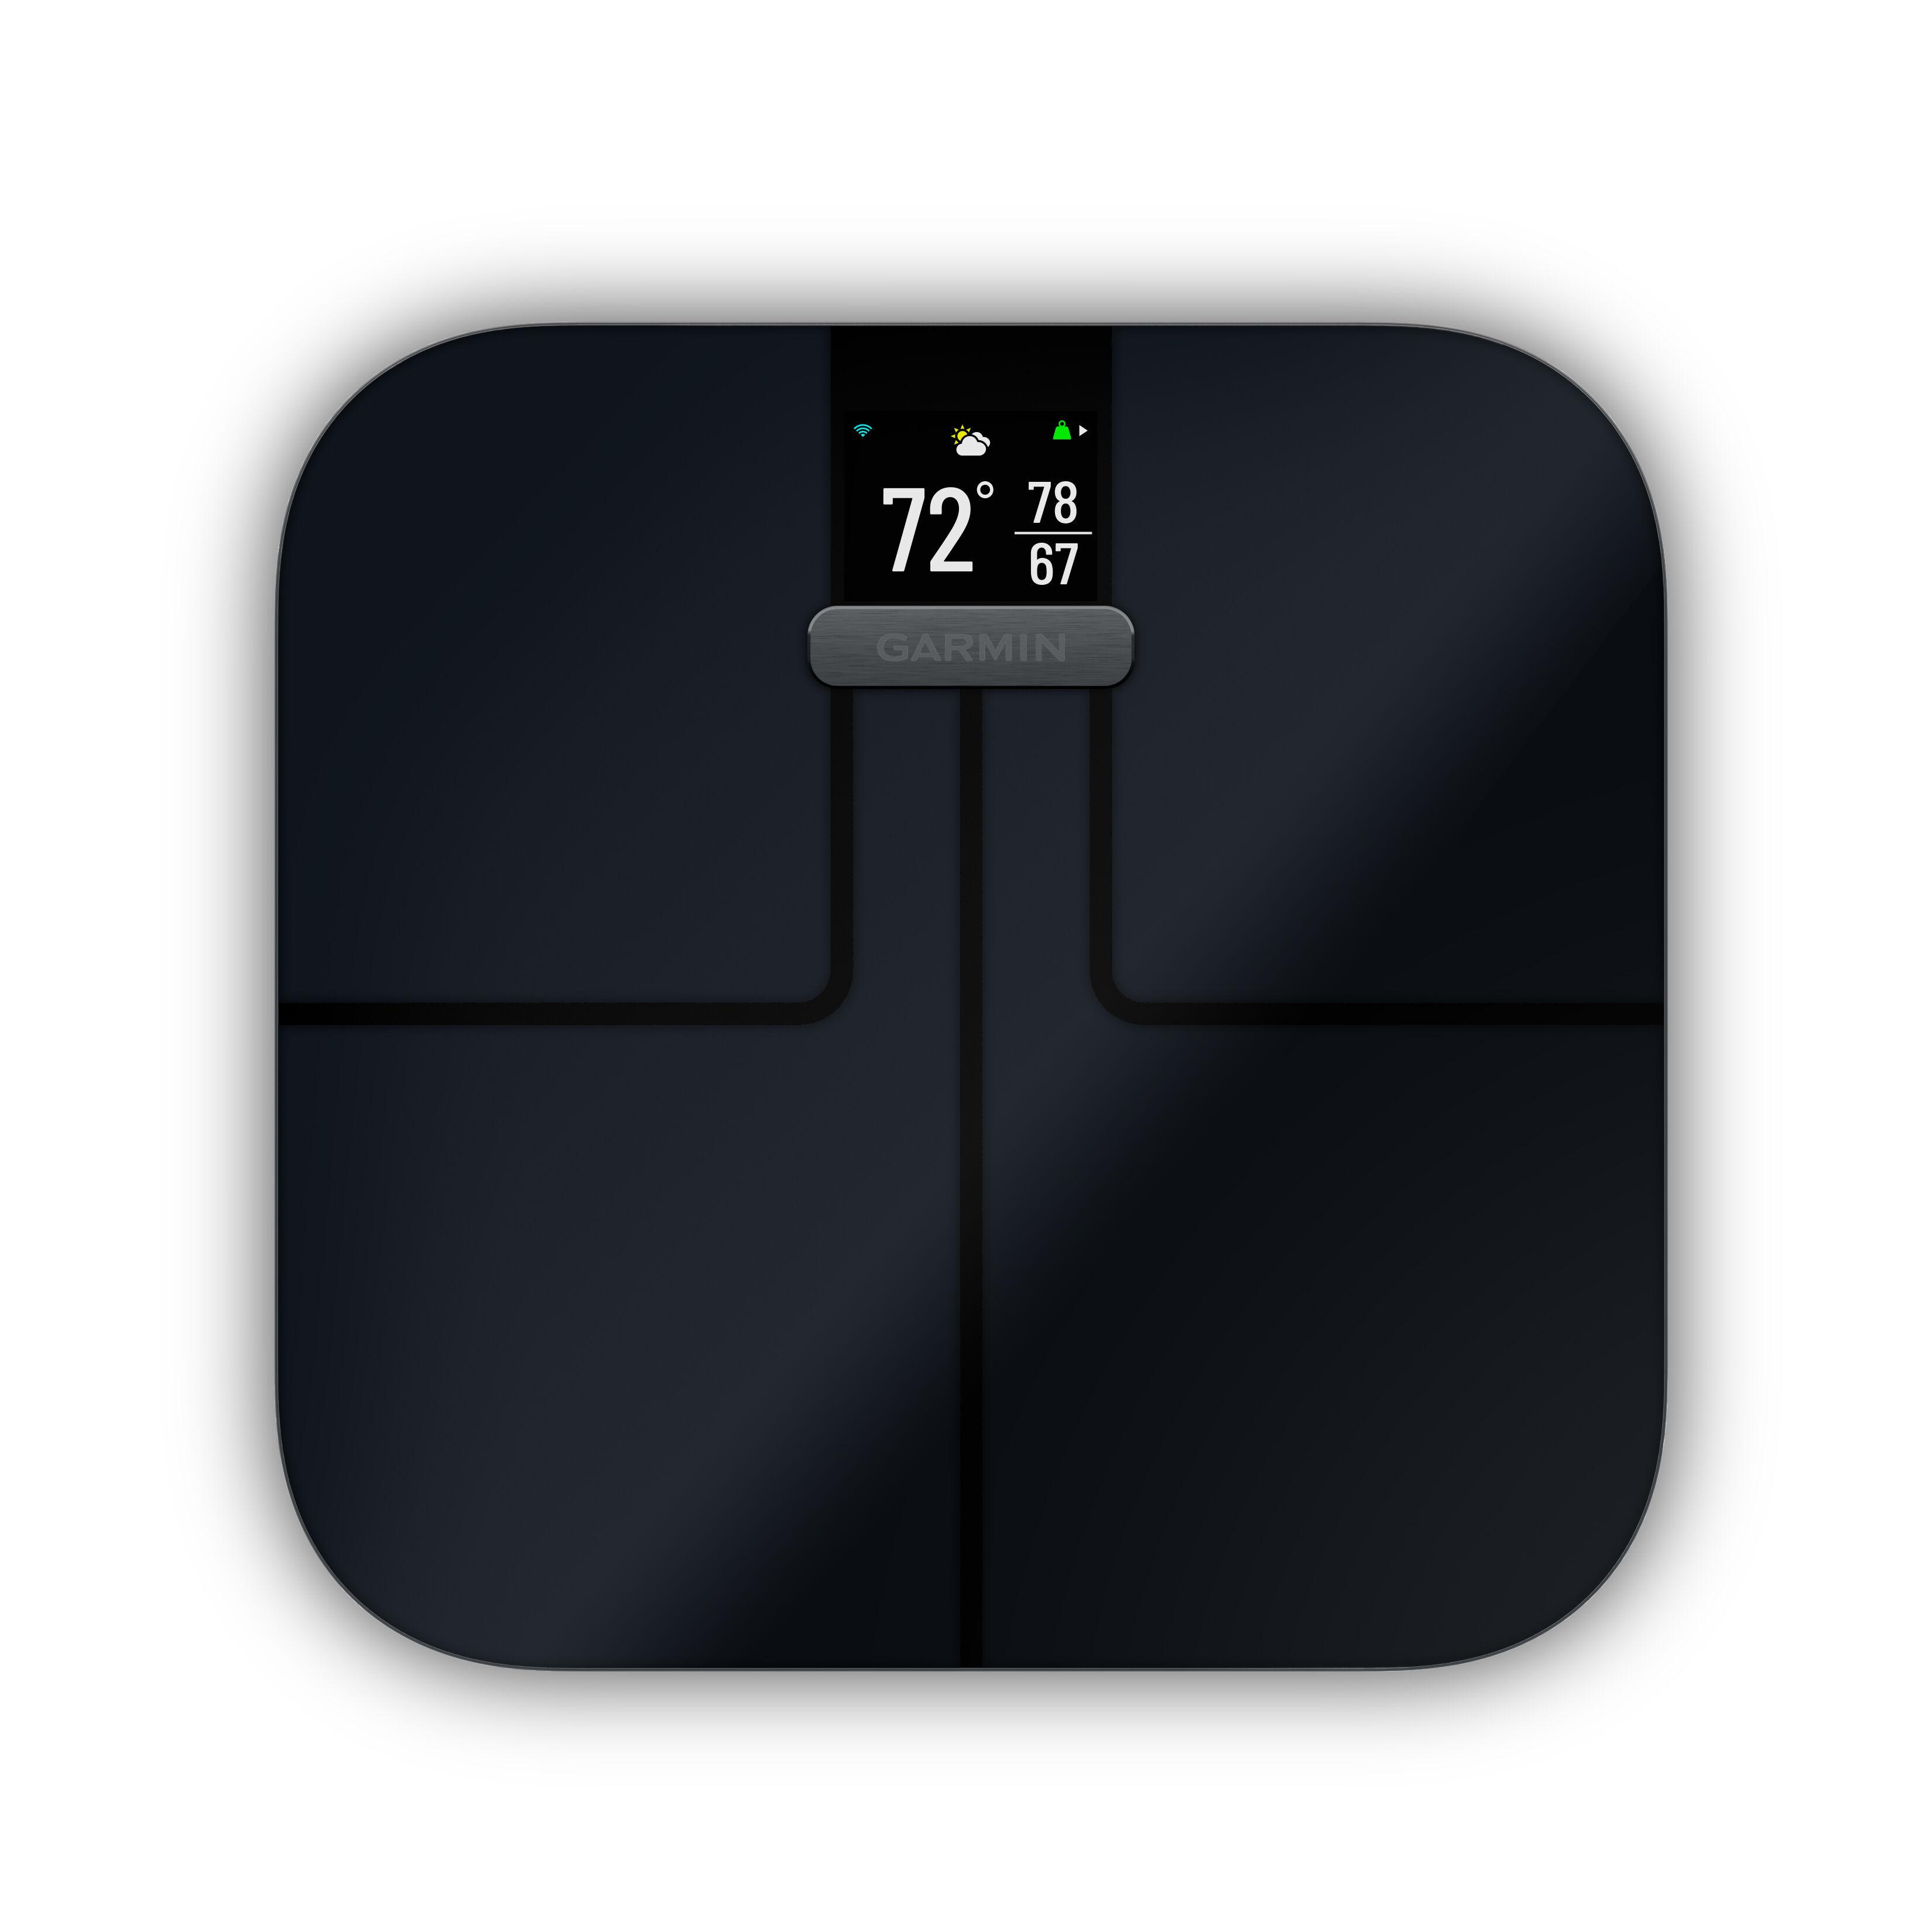 Garmin Index S2 Smart Scale